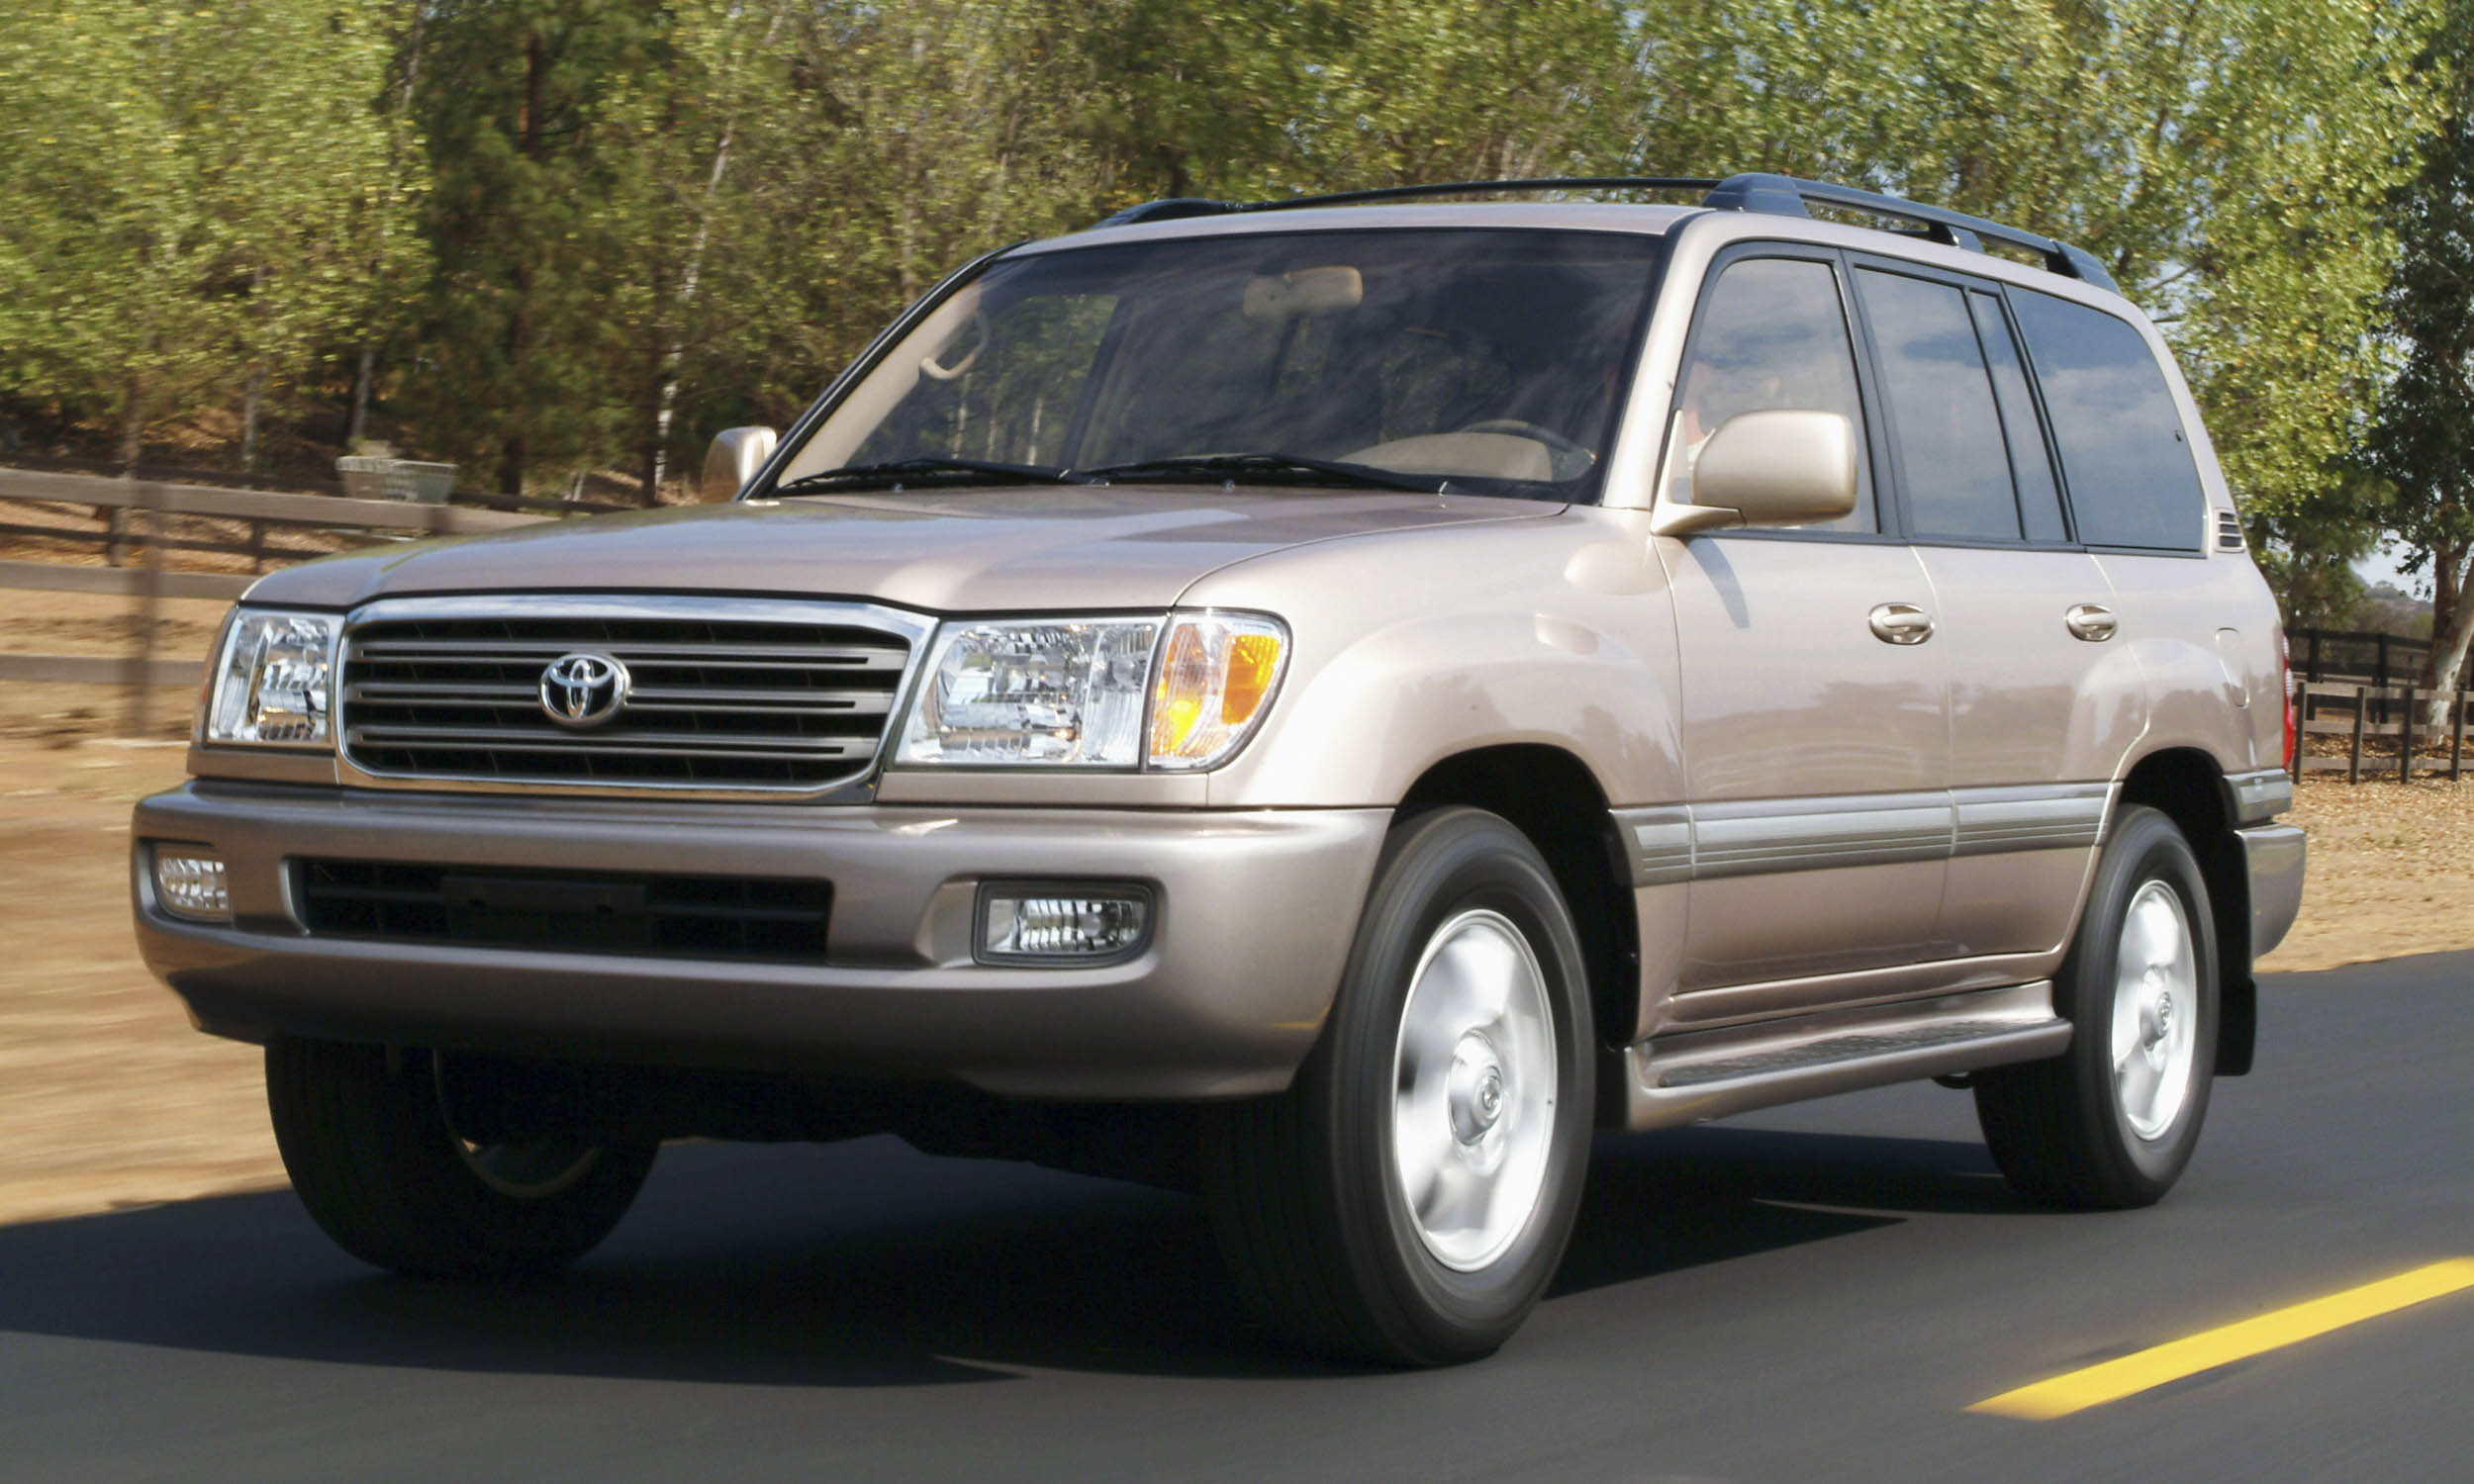 Kelebihan Toyota Land Cruiser 2003 Top Model Tahun Ini